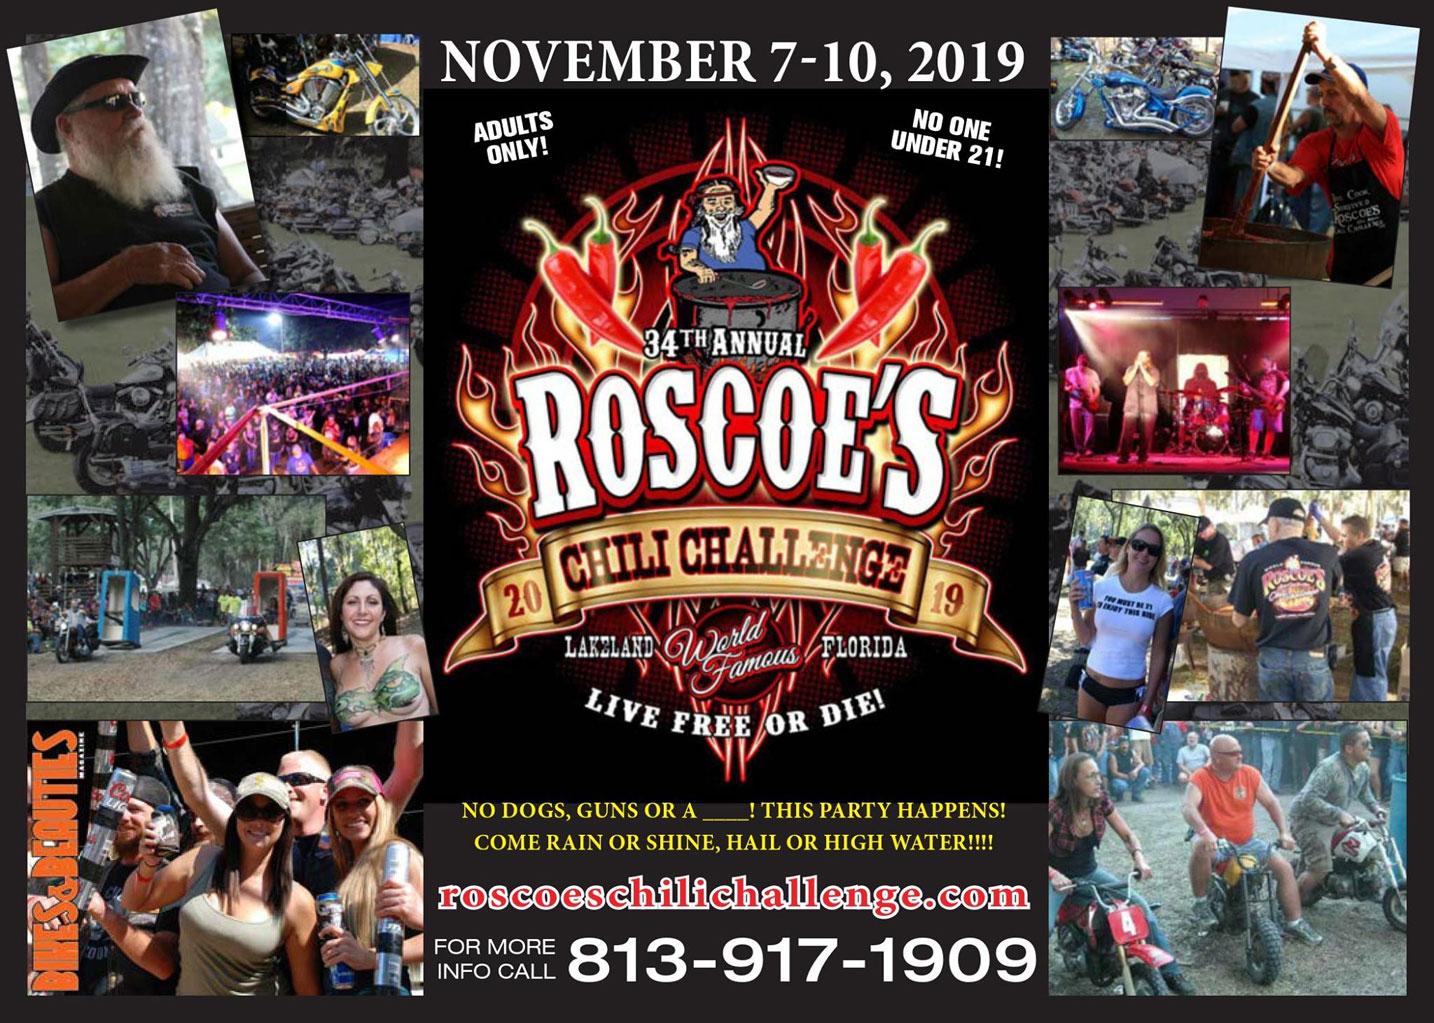 34TH Annual Roscoe's Chili Challenge Lakeland,FL